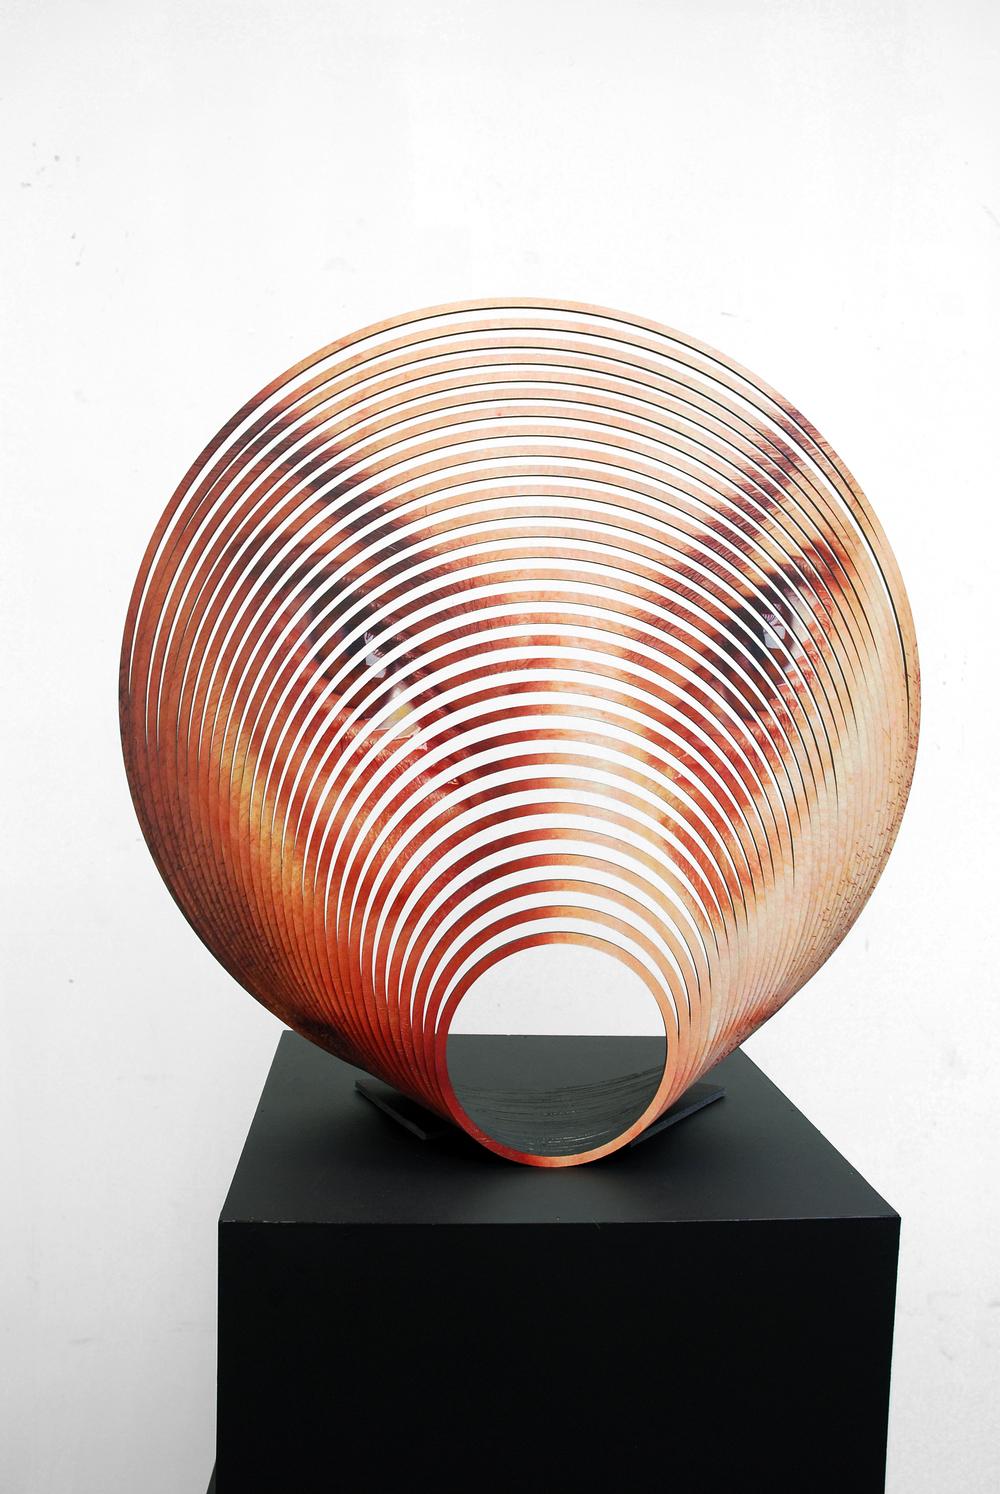 JUSTINE KHAMARA   Scalloped 1  2015 Laser-cut UV print on hoop pine plywood, acrylic paint 55 x 55 cm